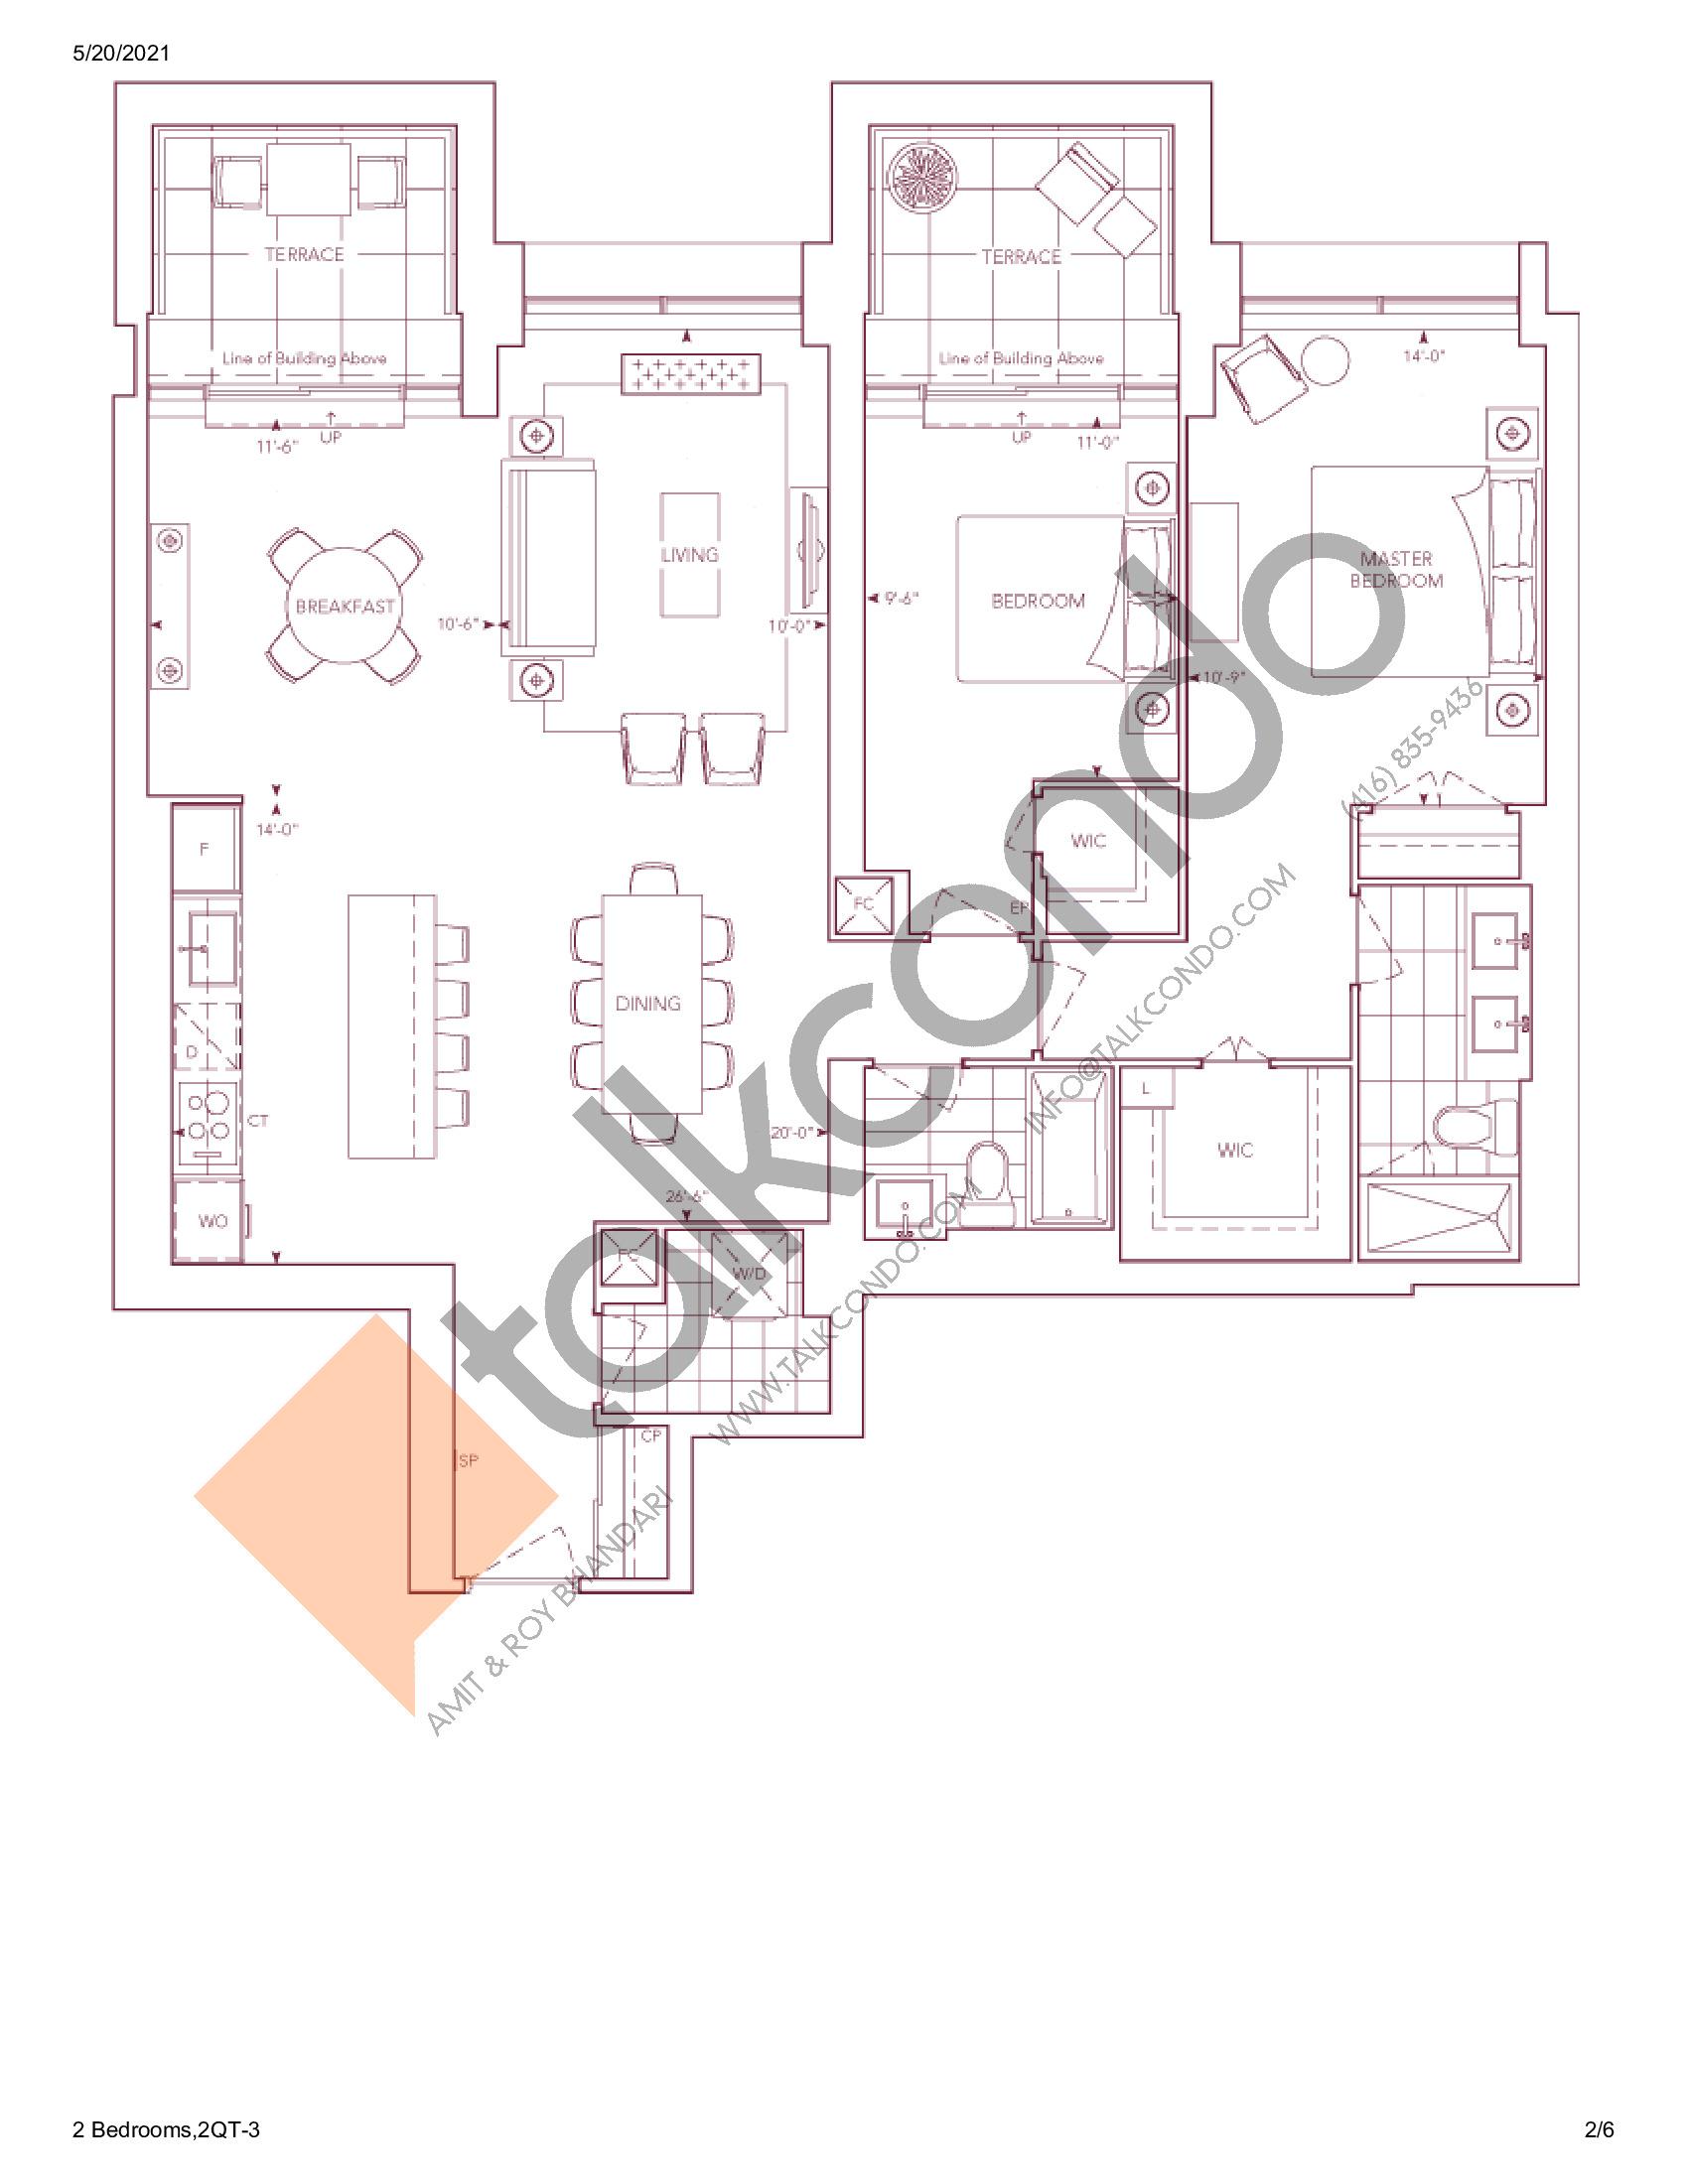 Chateau Auberge On The Park Condos Floor Plans Prices Availability Talkcondo